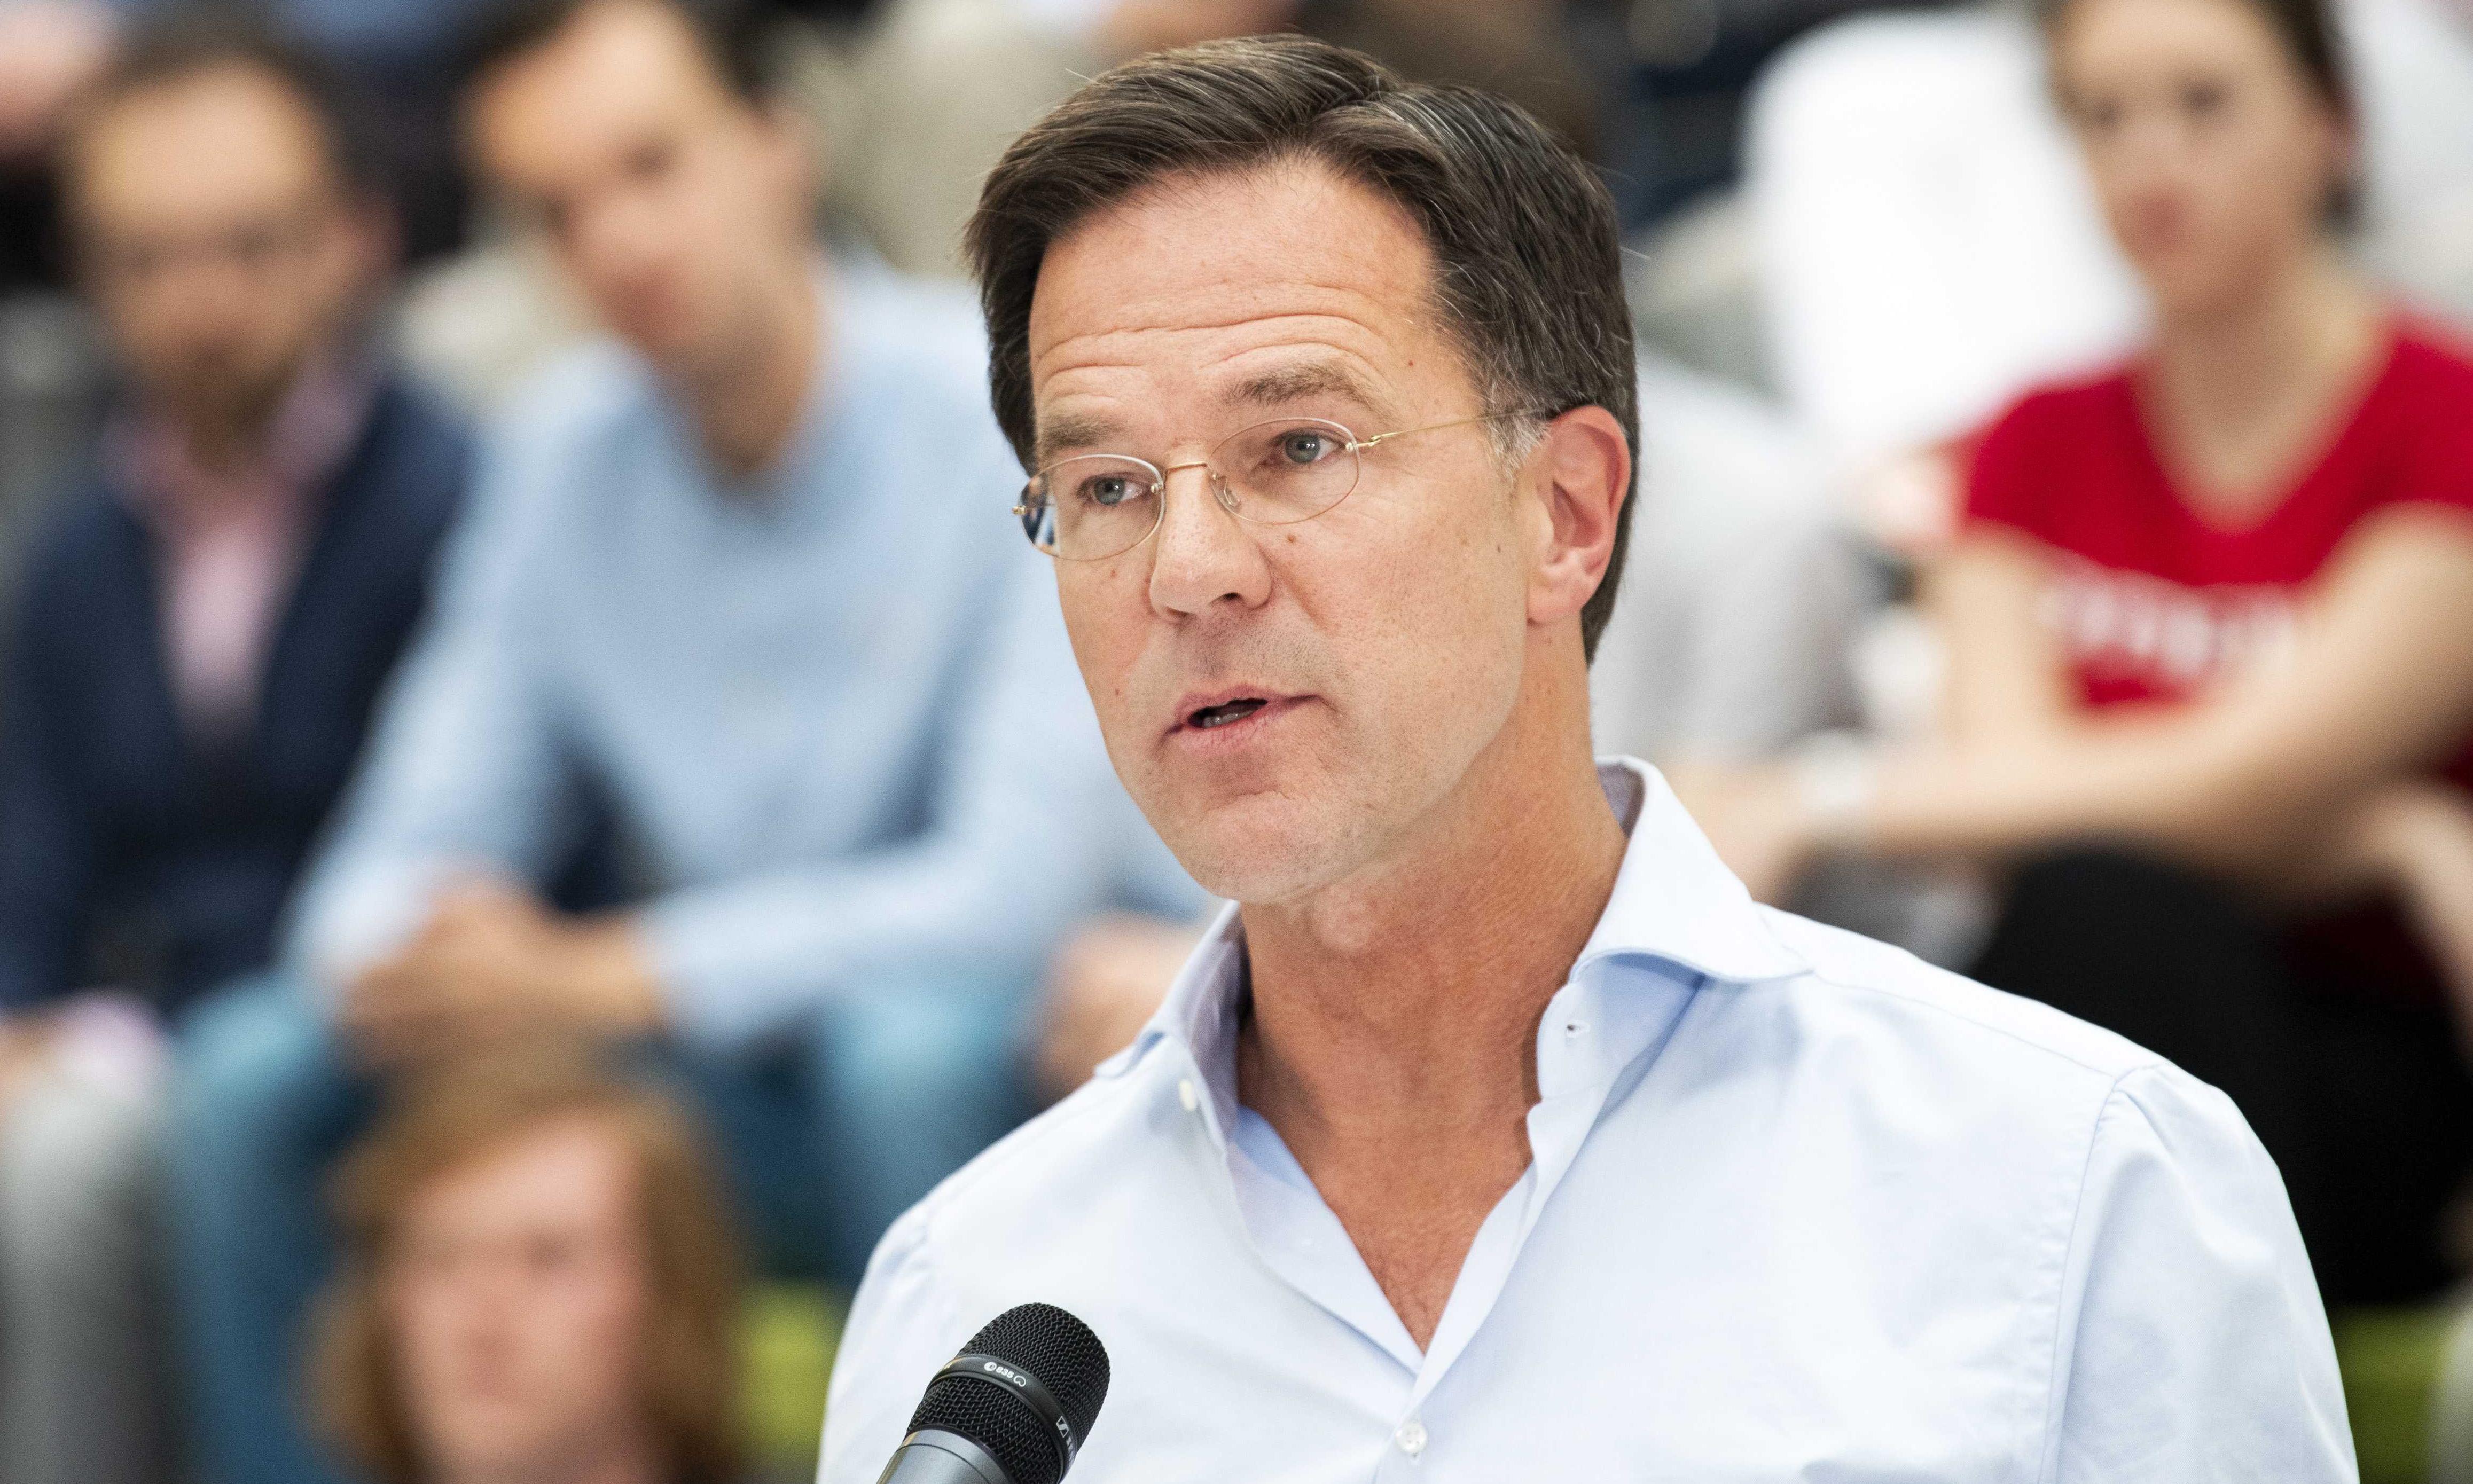 Netherlands' European election TV debate labelled a 'sham'